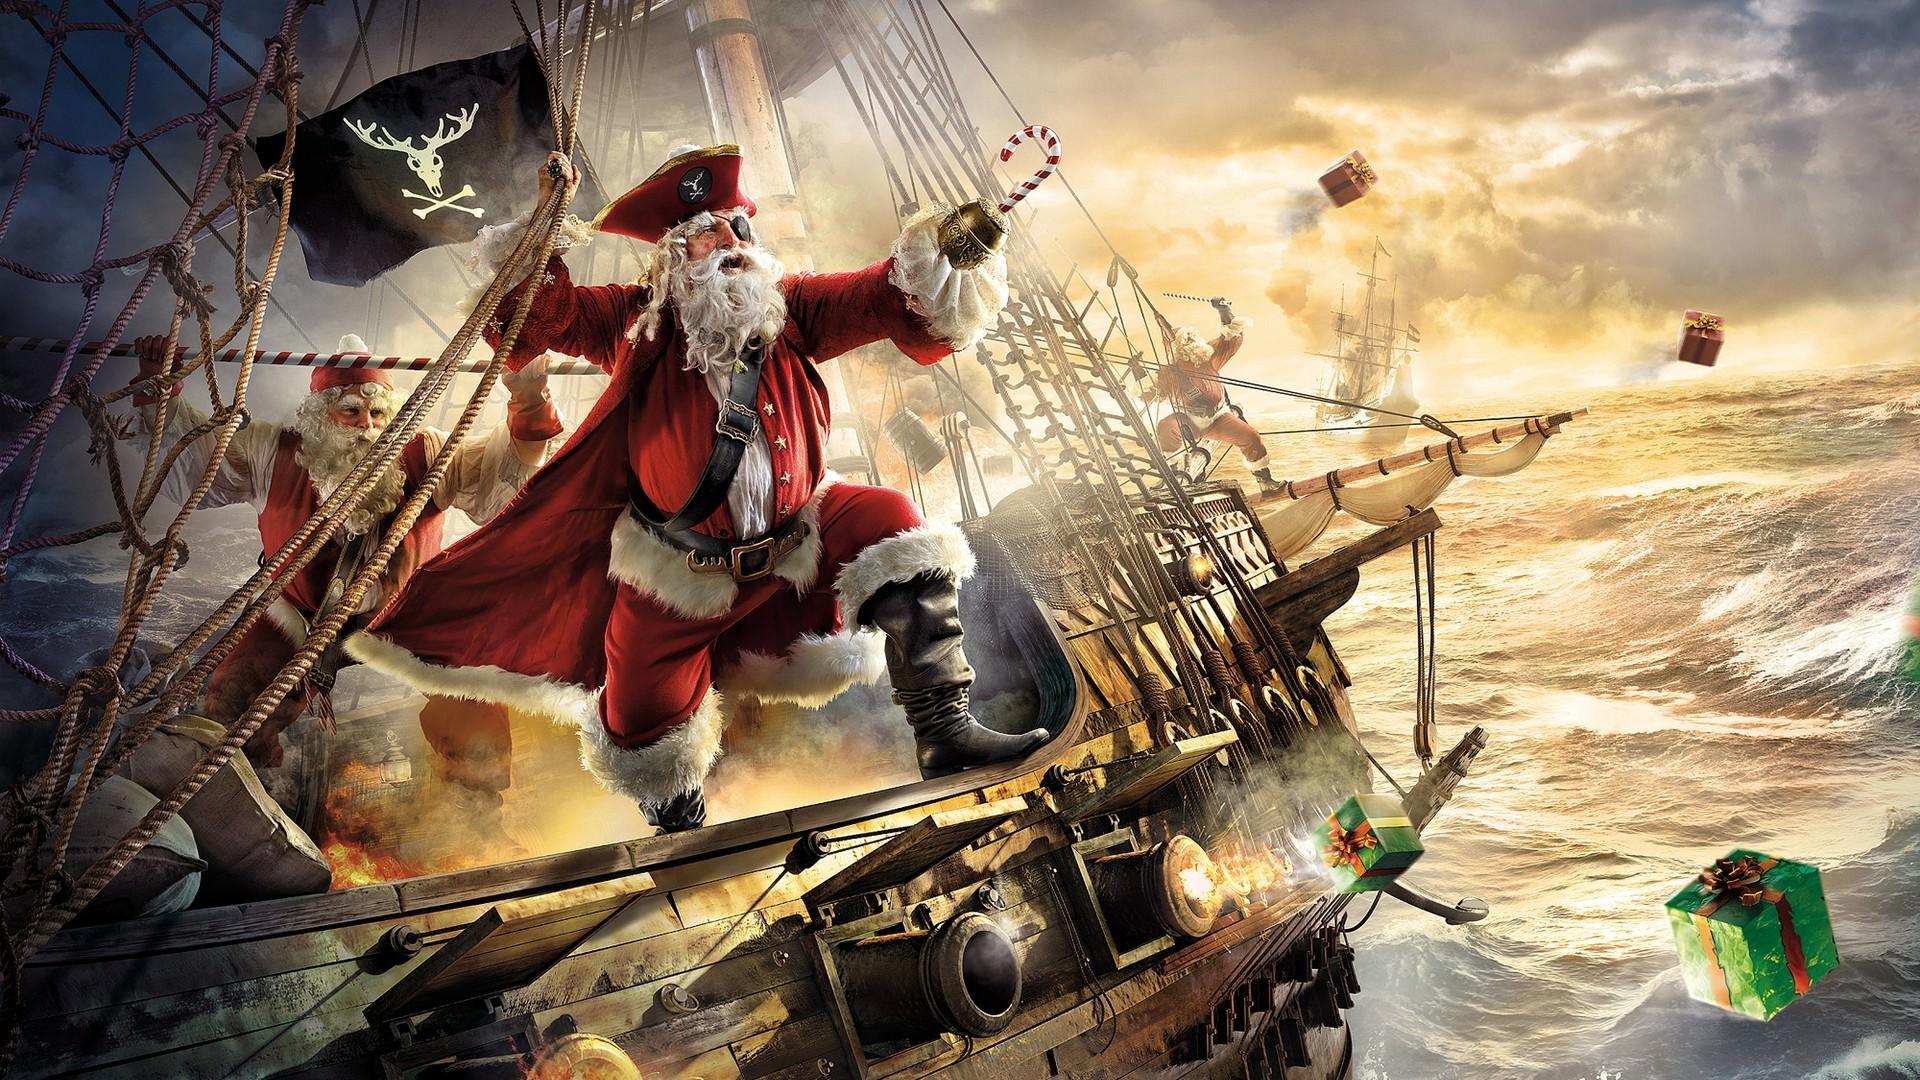 Epic Pirate Santa Clause Christmas Wallpaper – DigitalArt.io